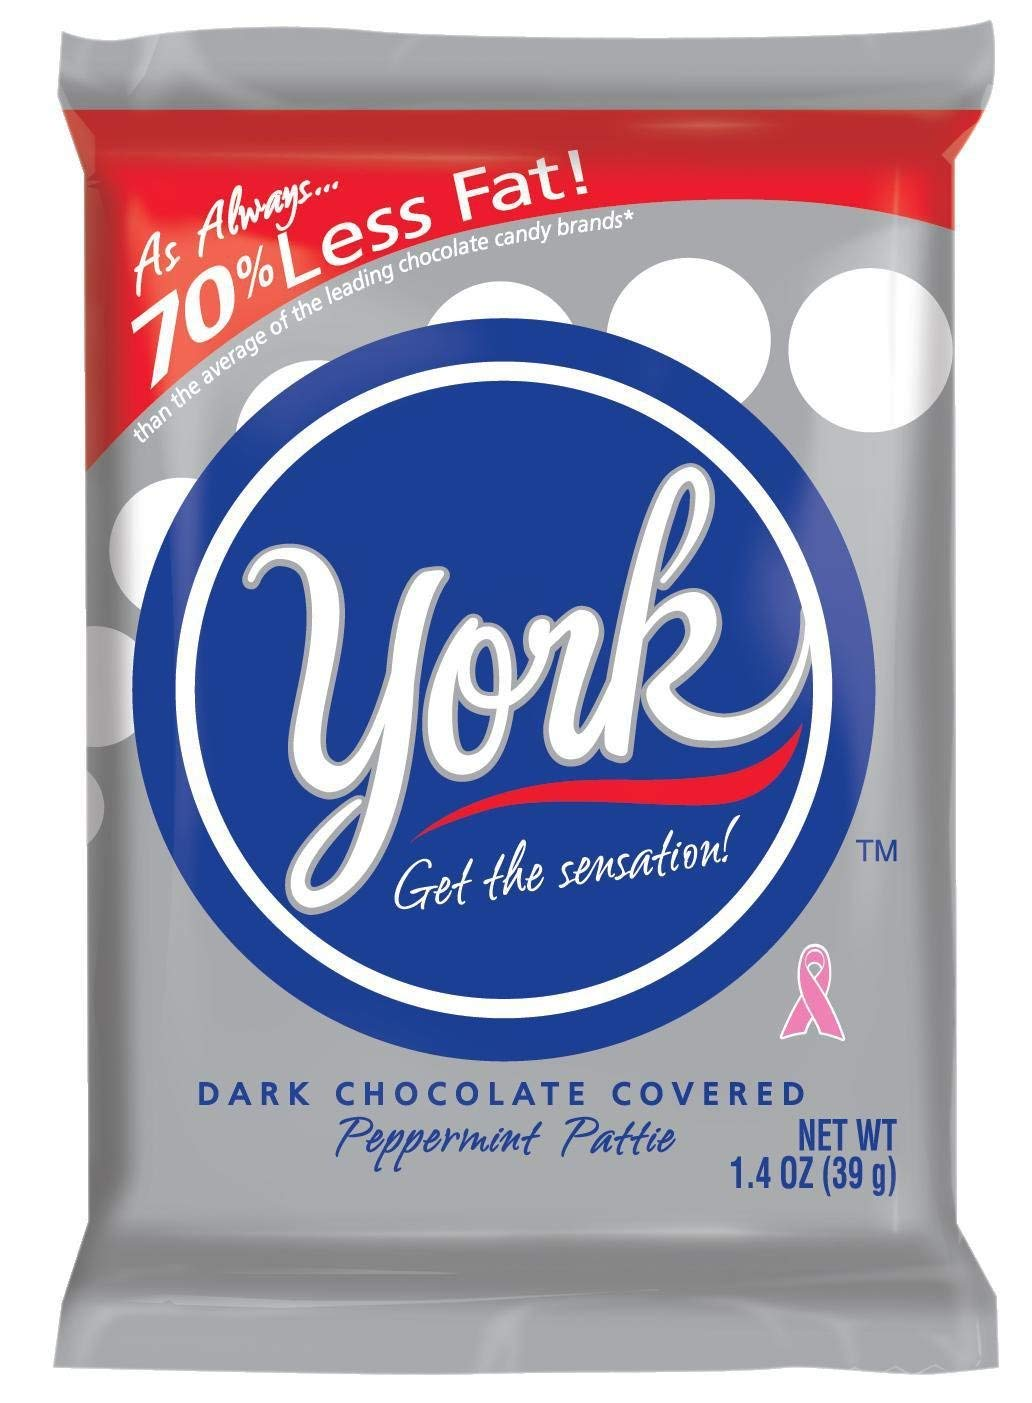 YORK Peppermint Patties 1.4 oz, 36 ct. A1